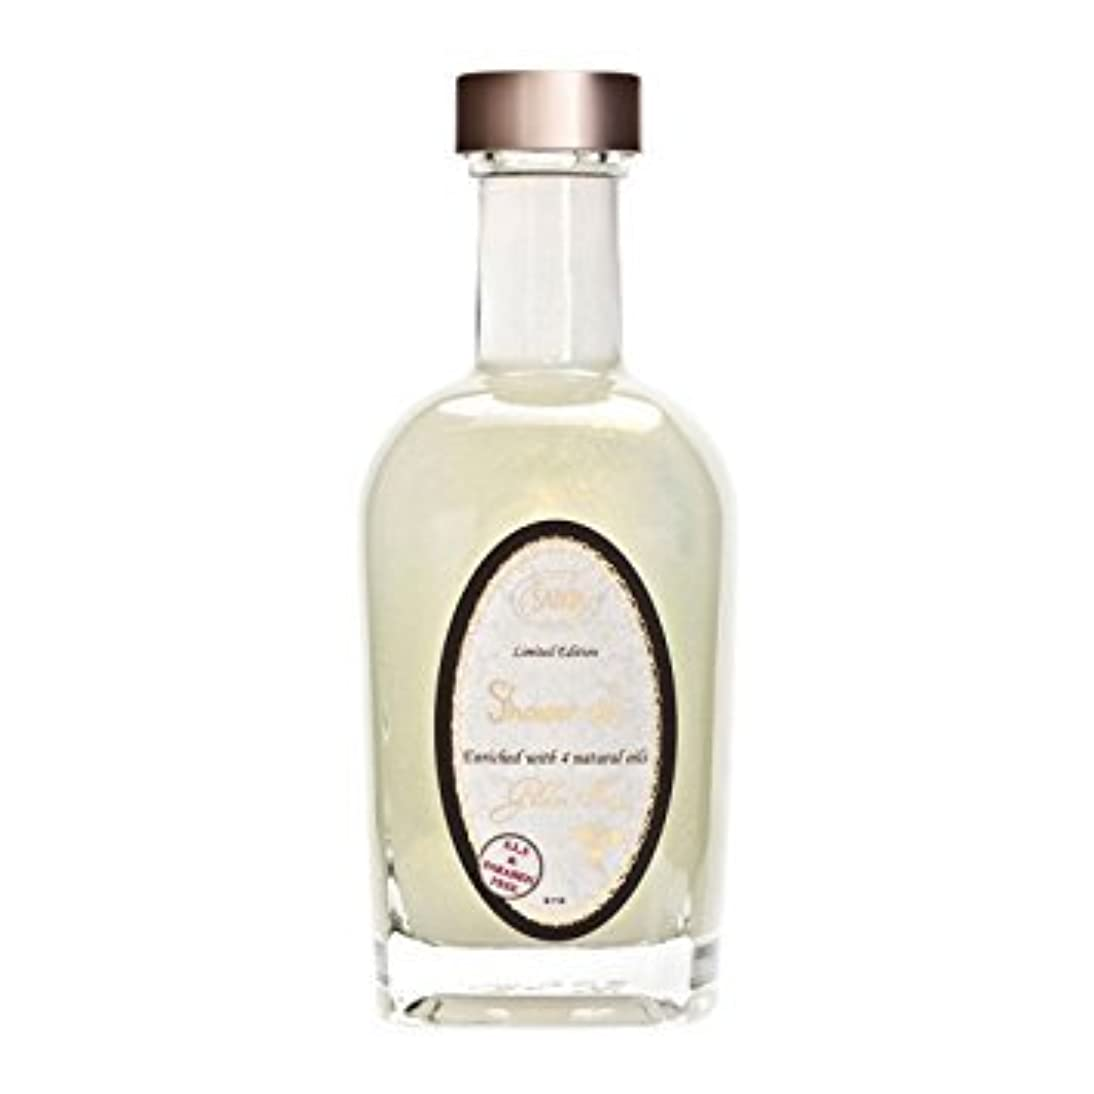 SABON Shower Oil サボン シャワーオイル 250ml 【Golden Iris ゴールデン アイリス】 イスラエル発 並行輸入品 海外直送 [並行輸入品]